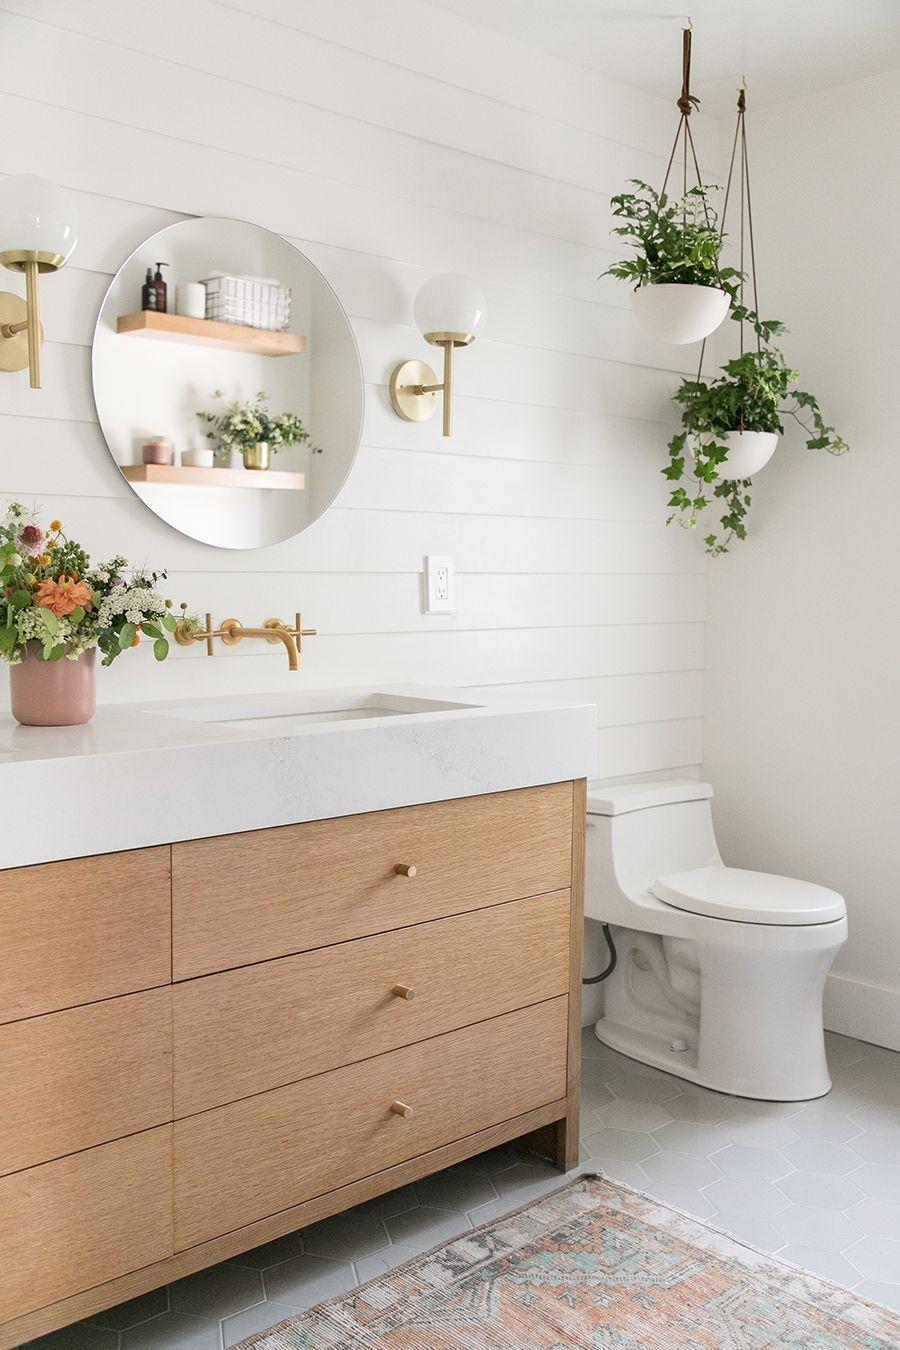 Photo of #bathroomideas My Charming Bathroom Reveal! – Sugar and Charm – bathroom